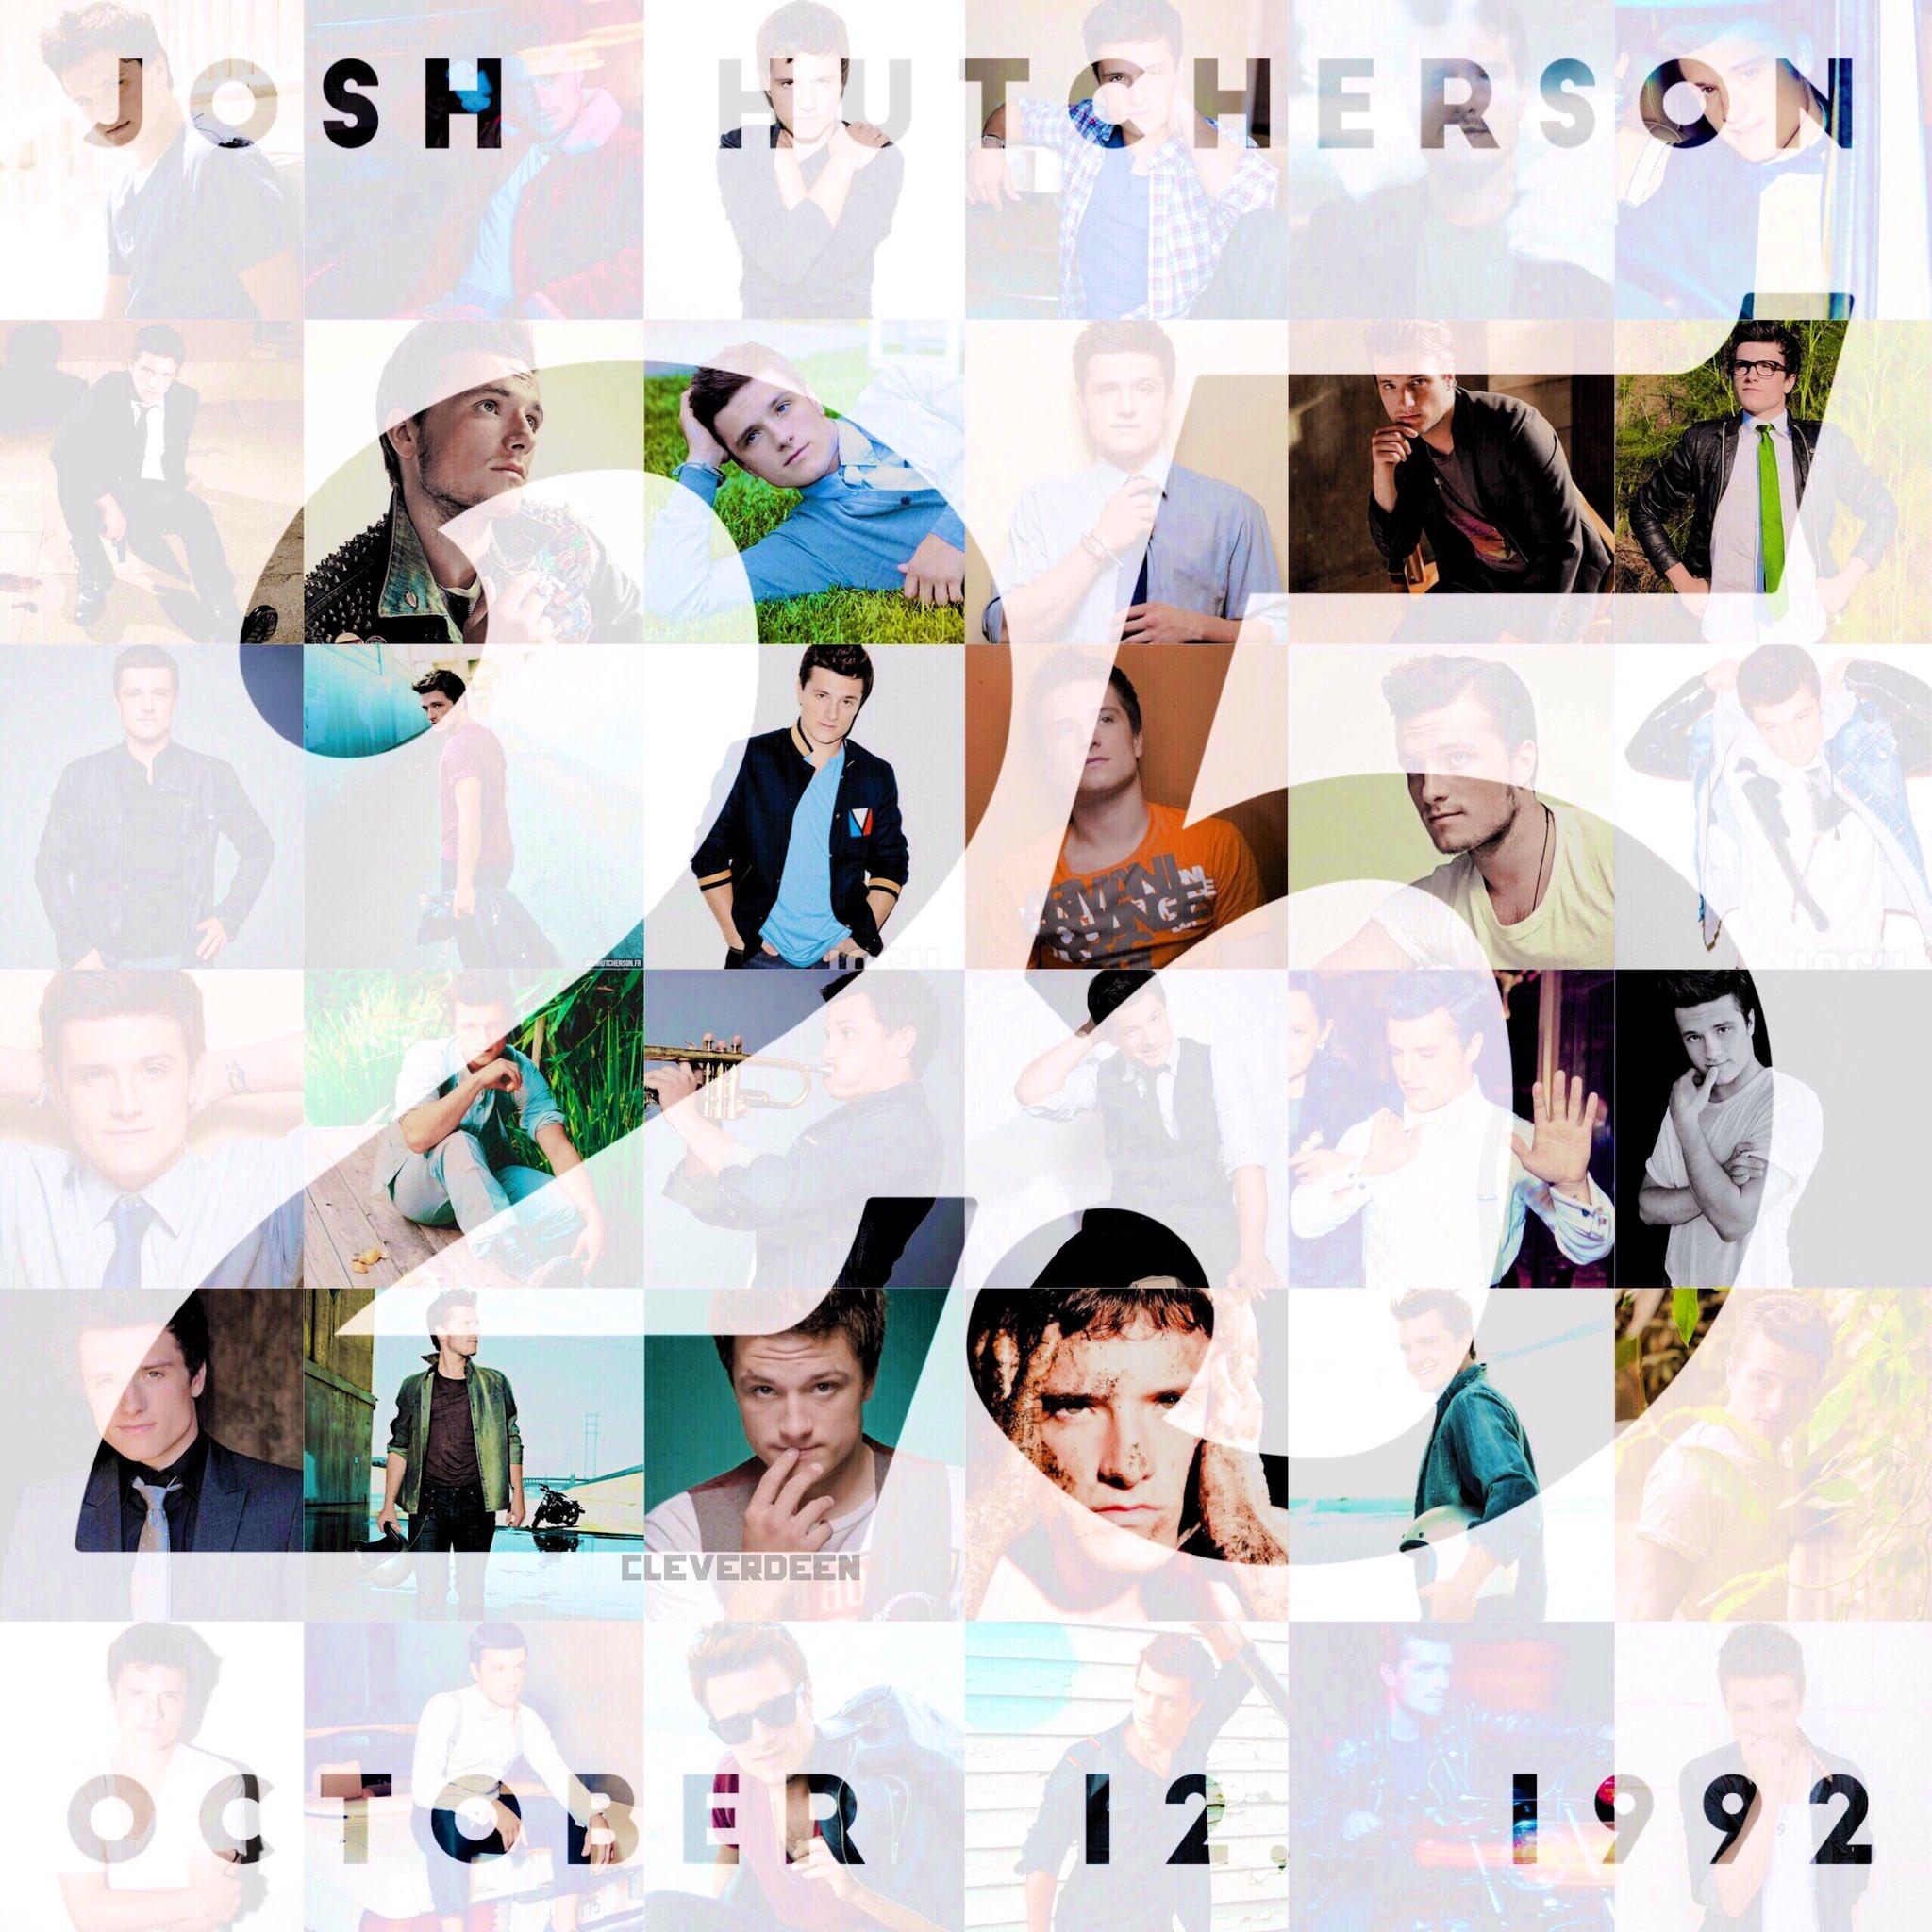 Happy 25th Birthday to our incredible Peeta, Josh Hutcherson!